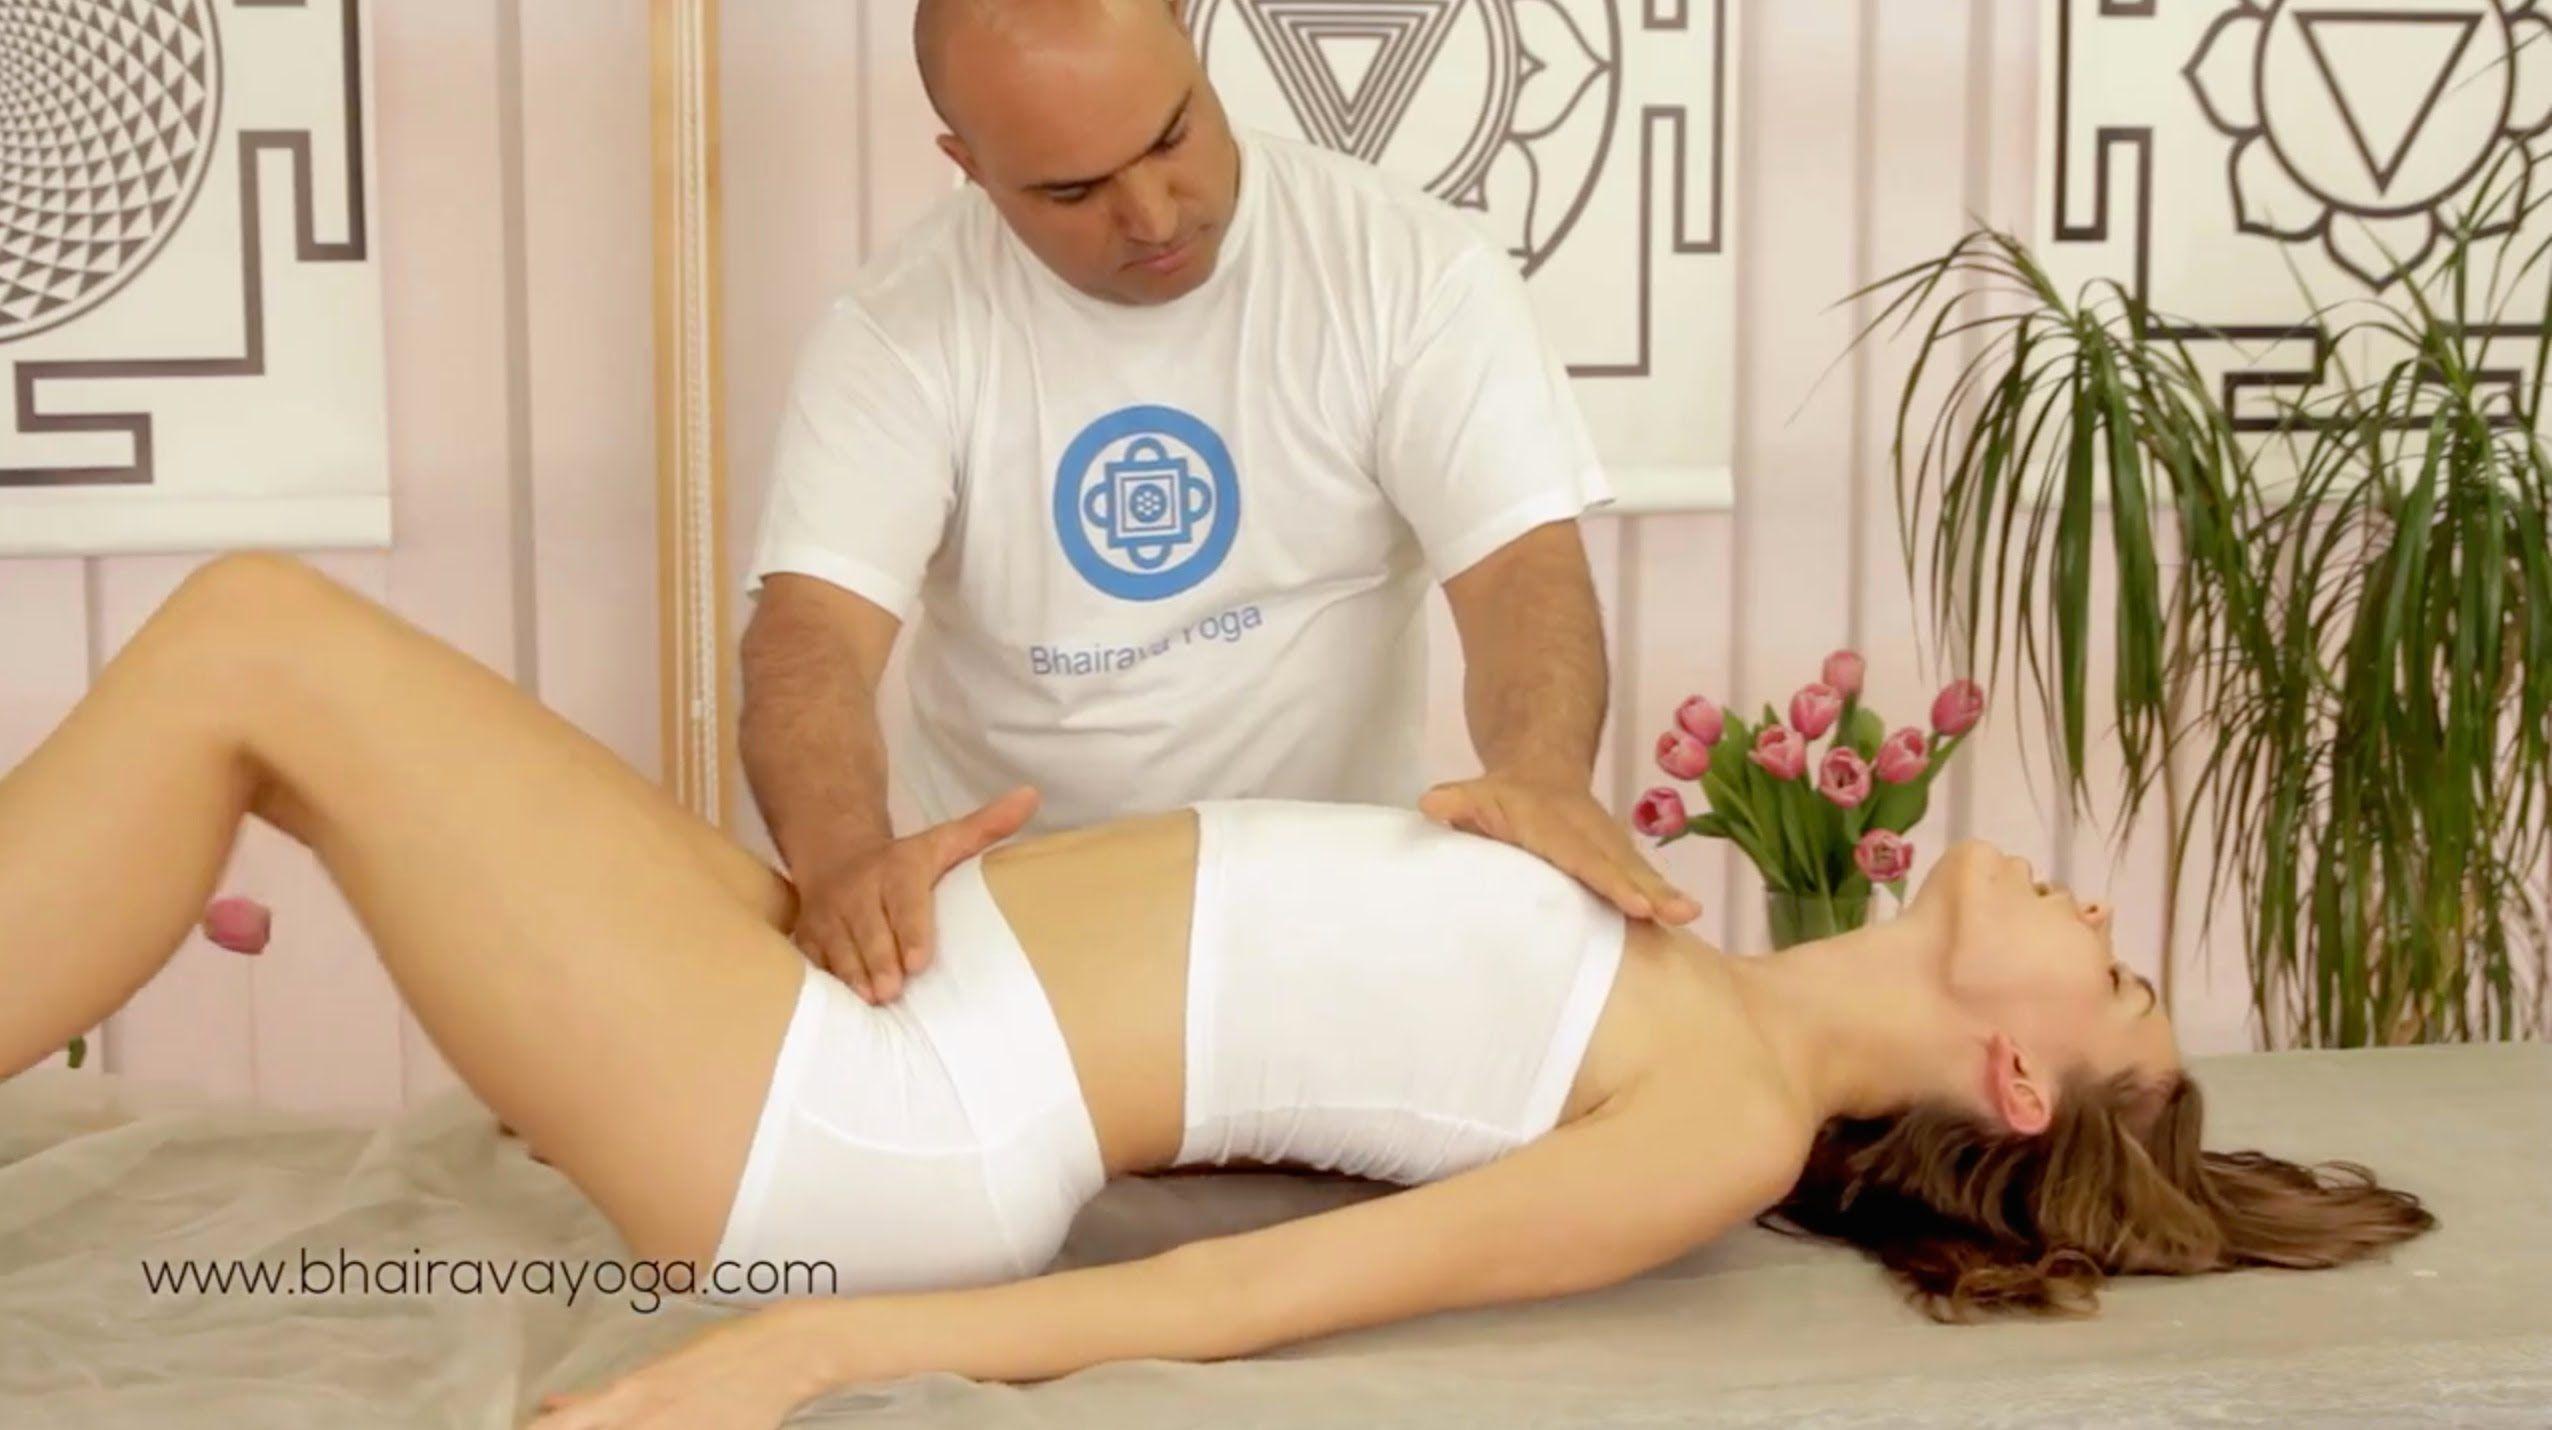 massage guide københavn copenhagen erotic massage